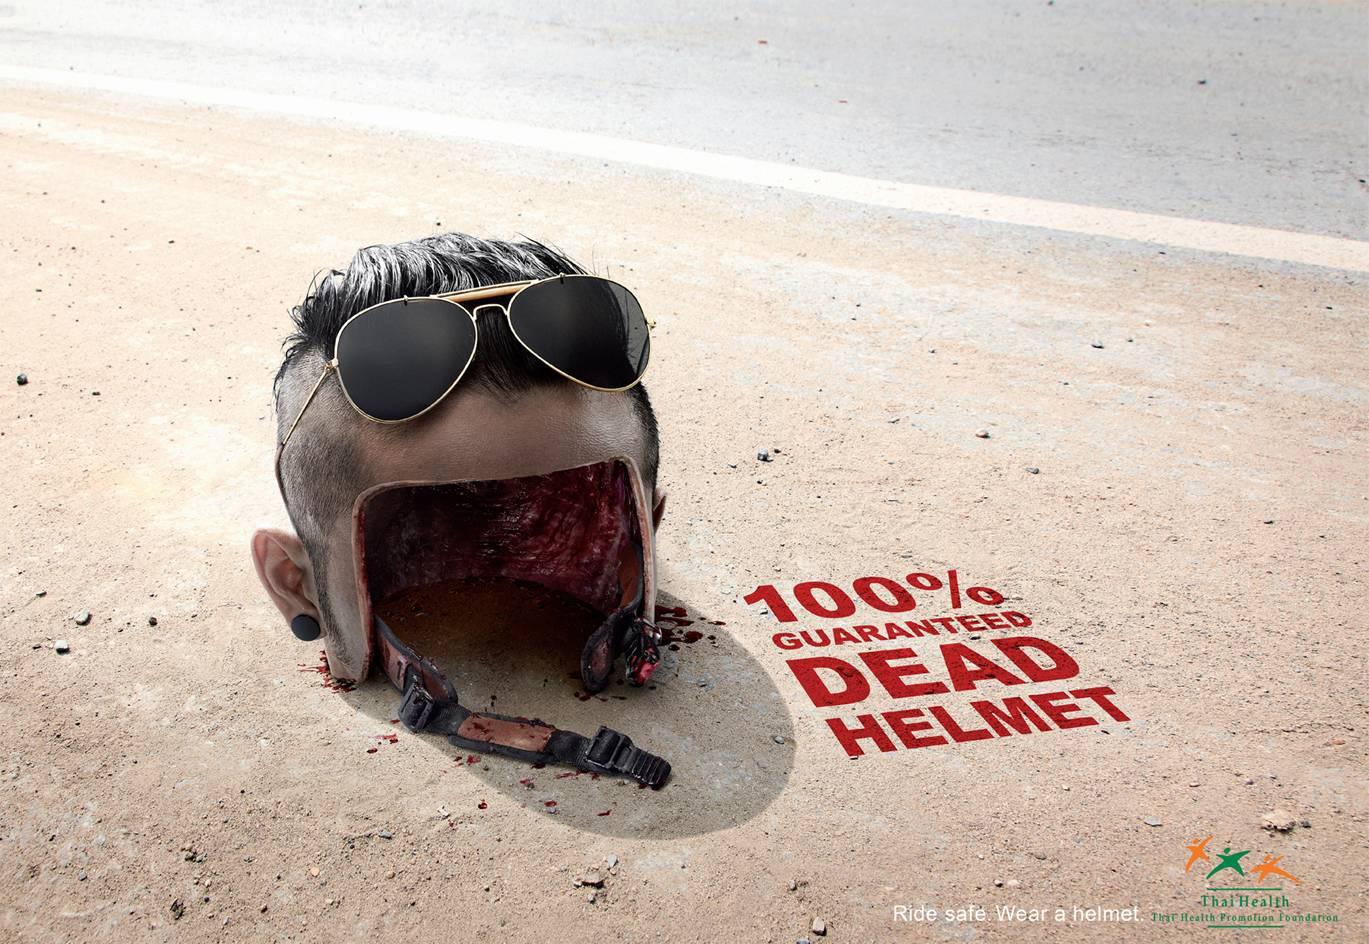 Thai Health Promotion Foundation Print Ad -  Dead Helmet, 2